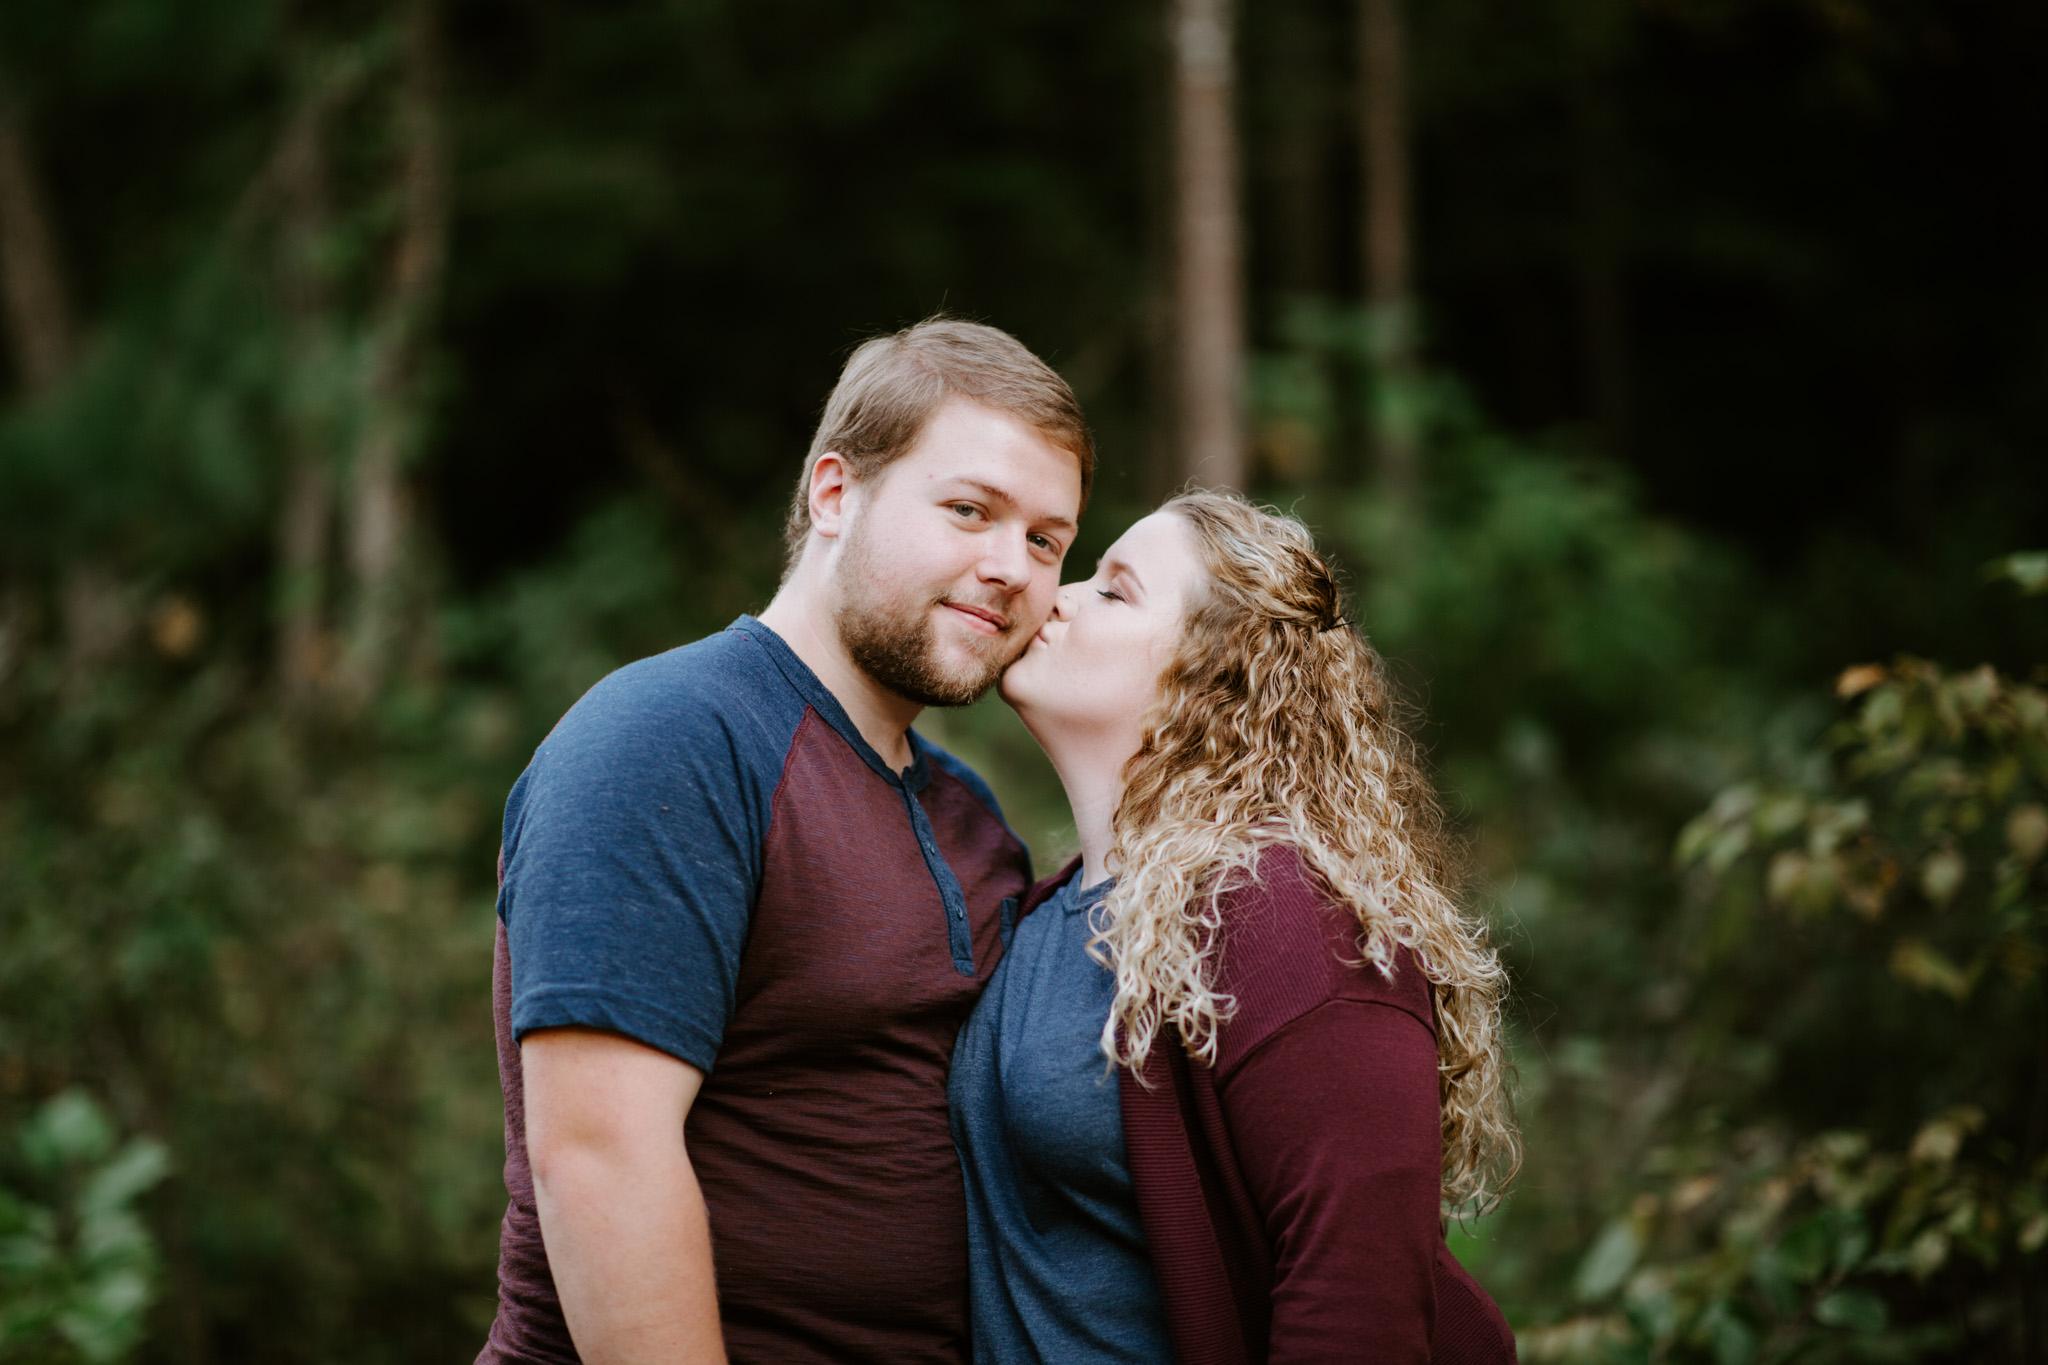 Kaitlin + Blake + Chattanooga + Tennessee + Engagement + Ocoee River + Wedding + Photographer-57.jpg